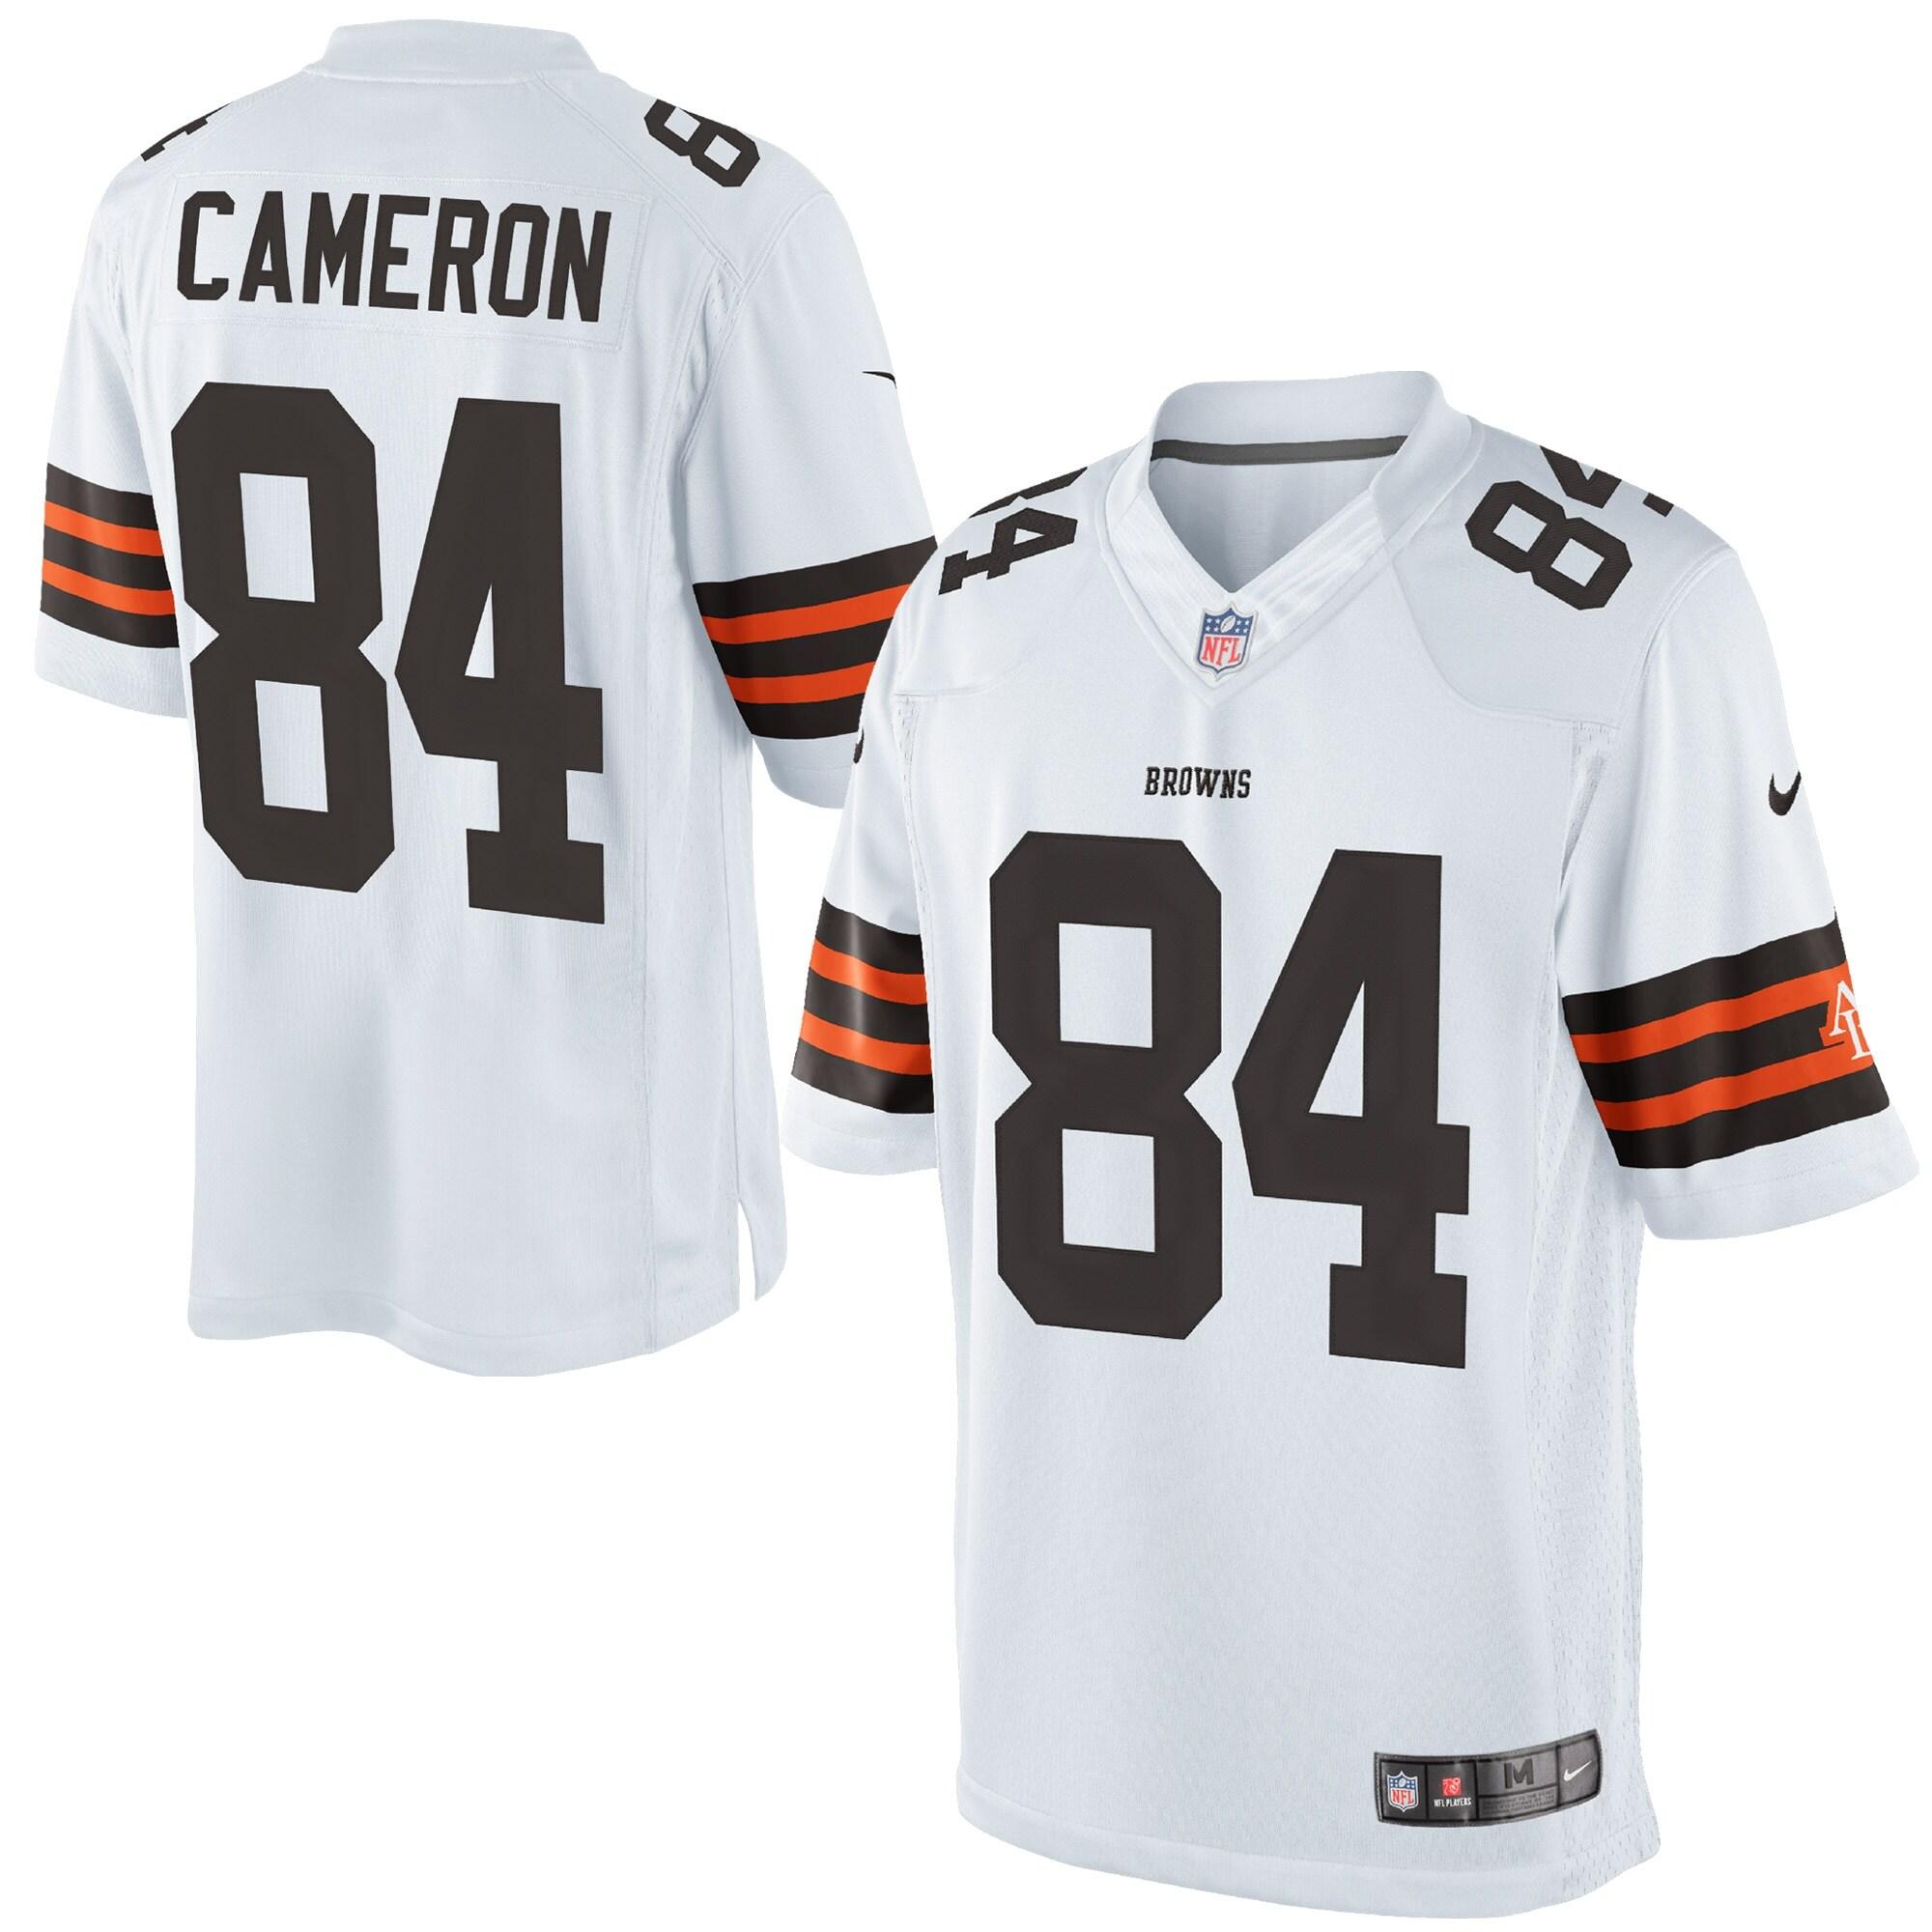 Jordan Cameron Cleveland Browns Historic Logo Nike Limited Jersey - White